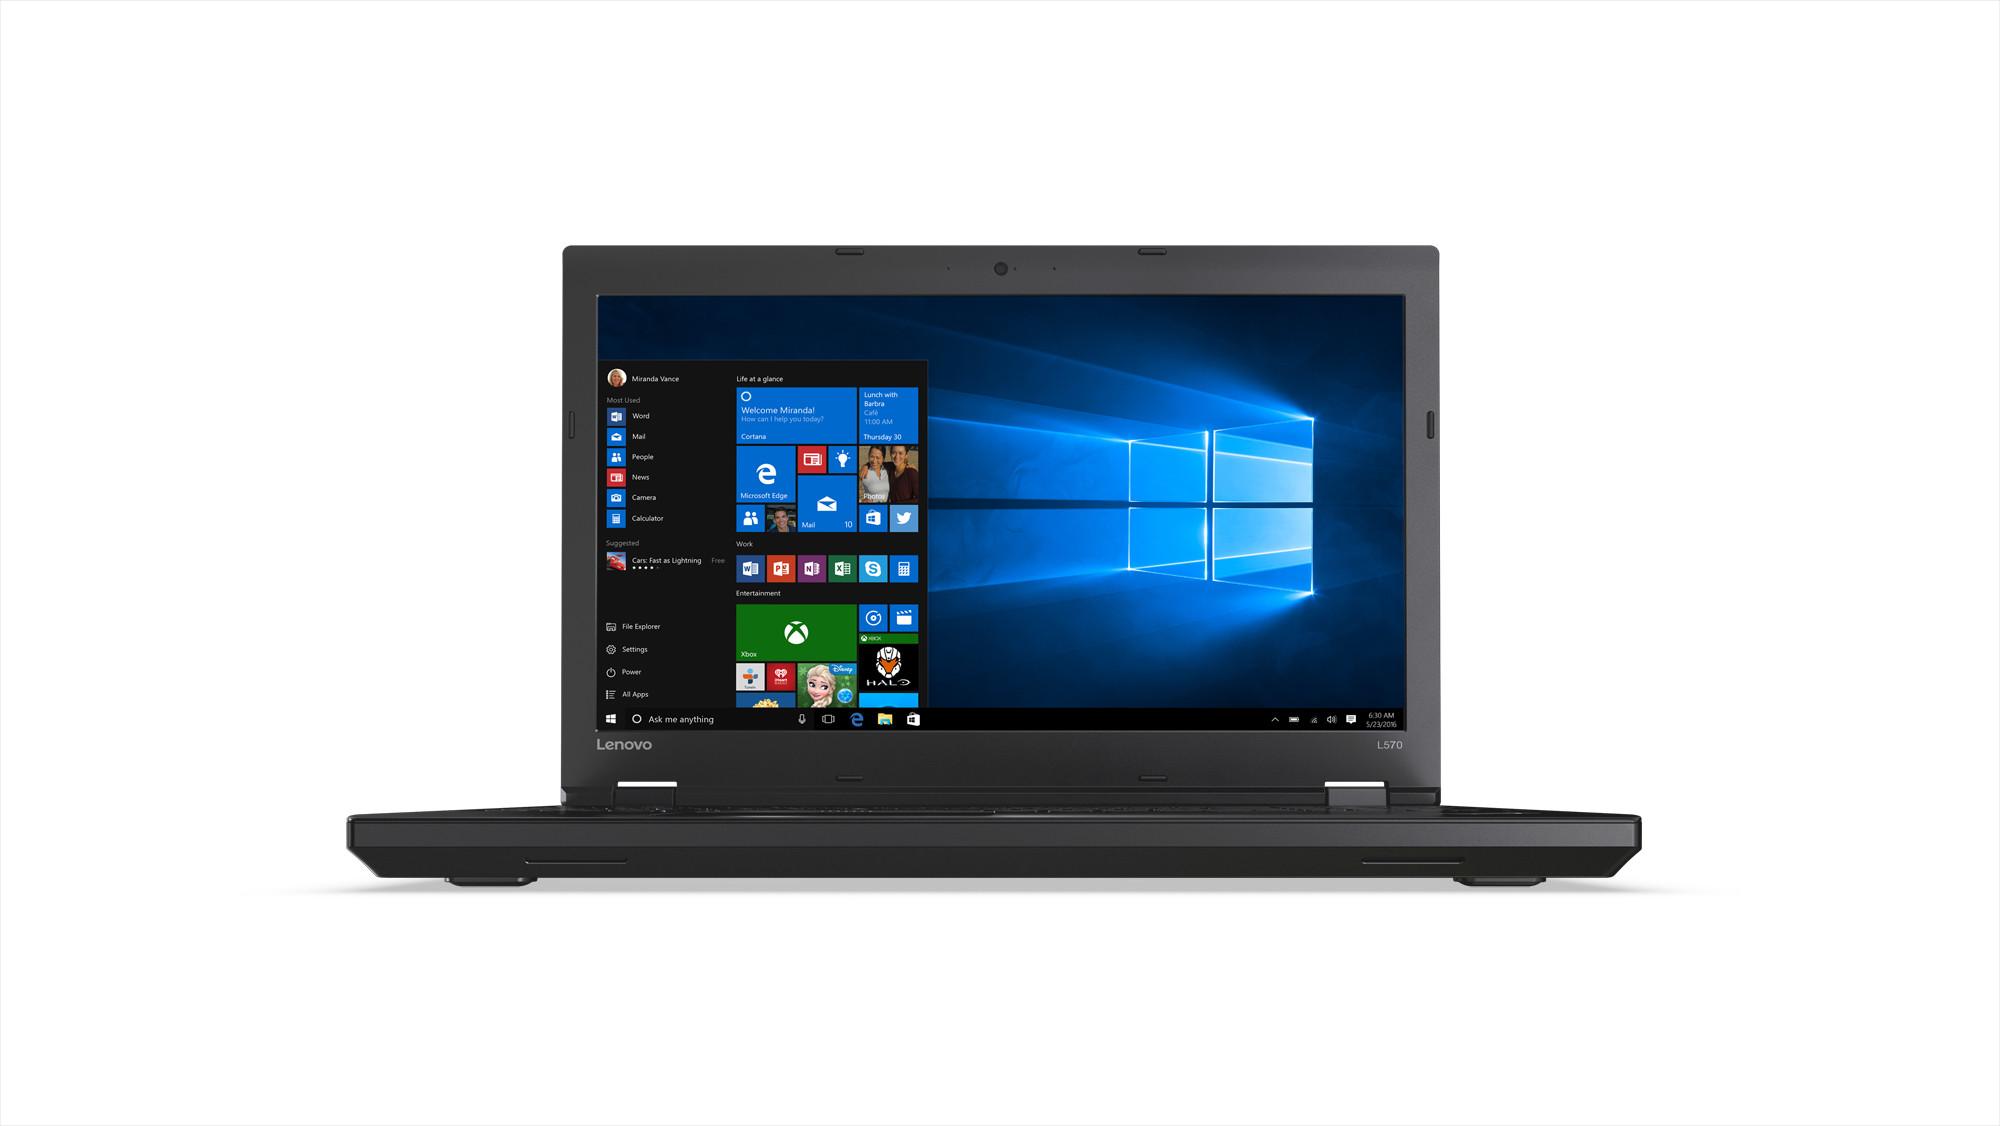 "Lenovo V110-17IKB i5-7200U/8GB/1TB-5400/DVD-RW/Radeon2GB/17,3""HD+ matný/W10"